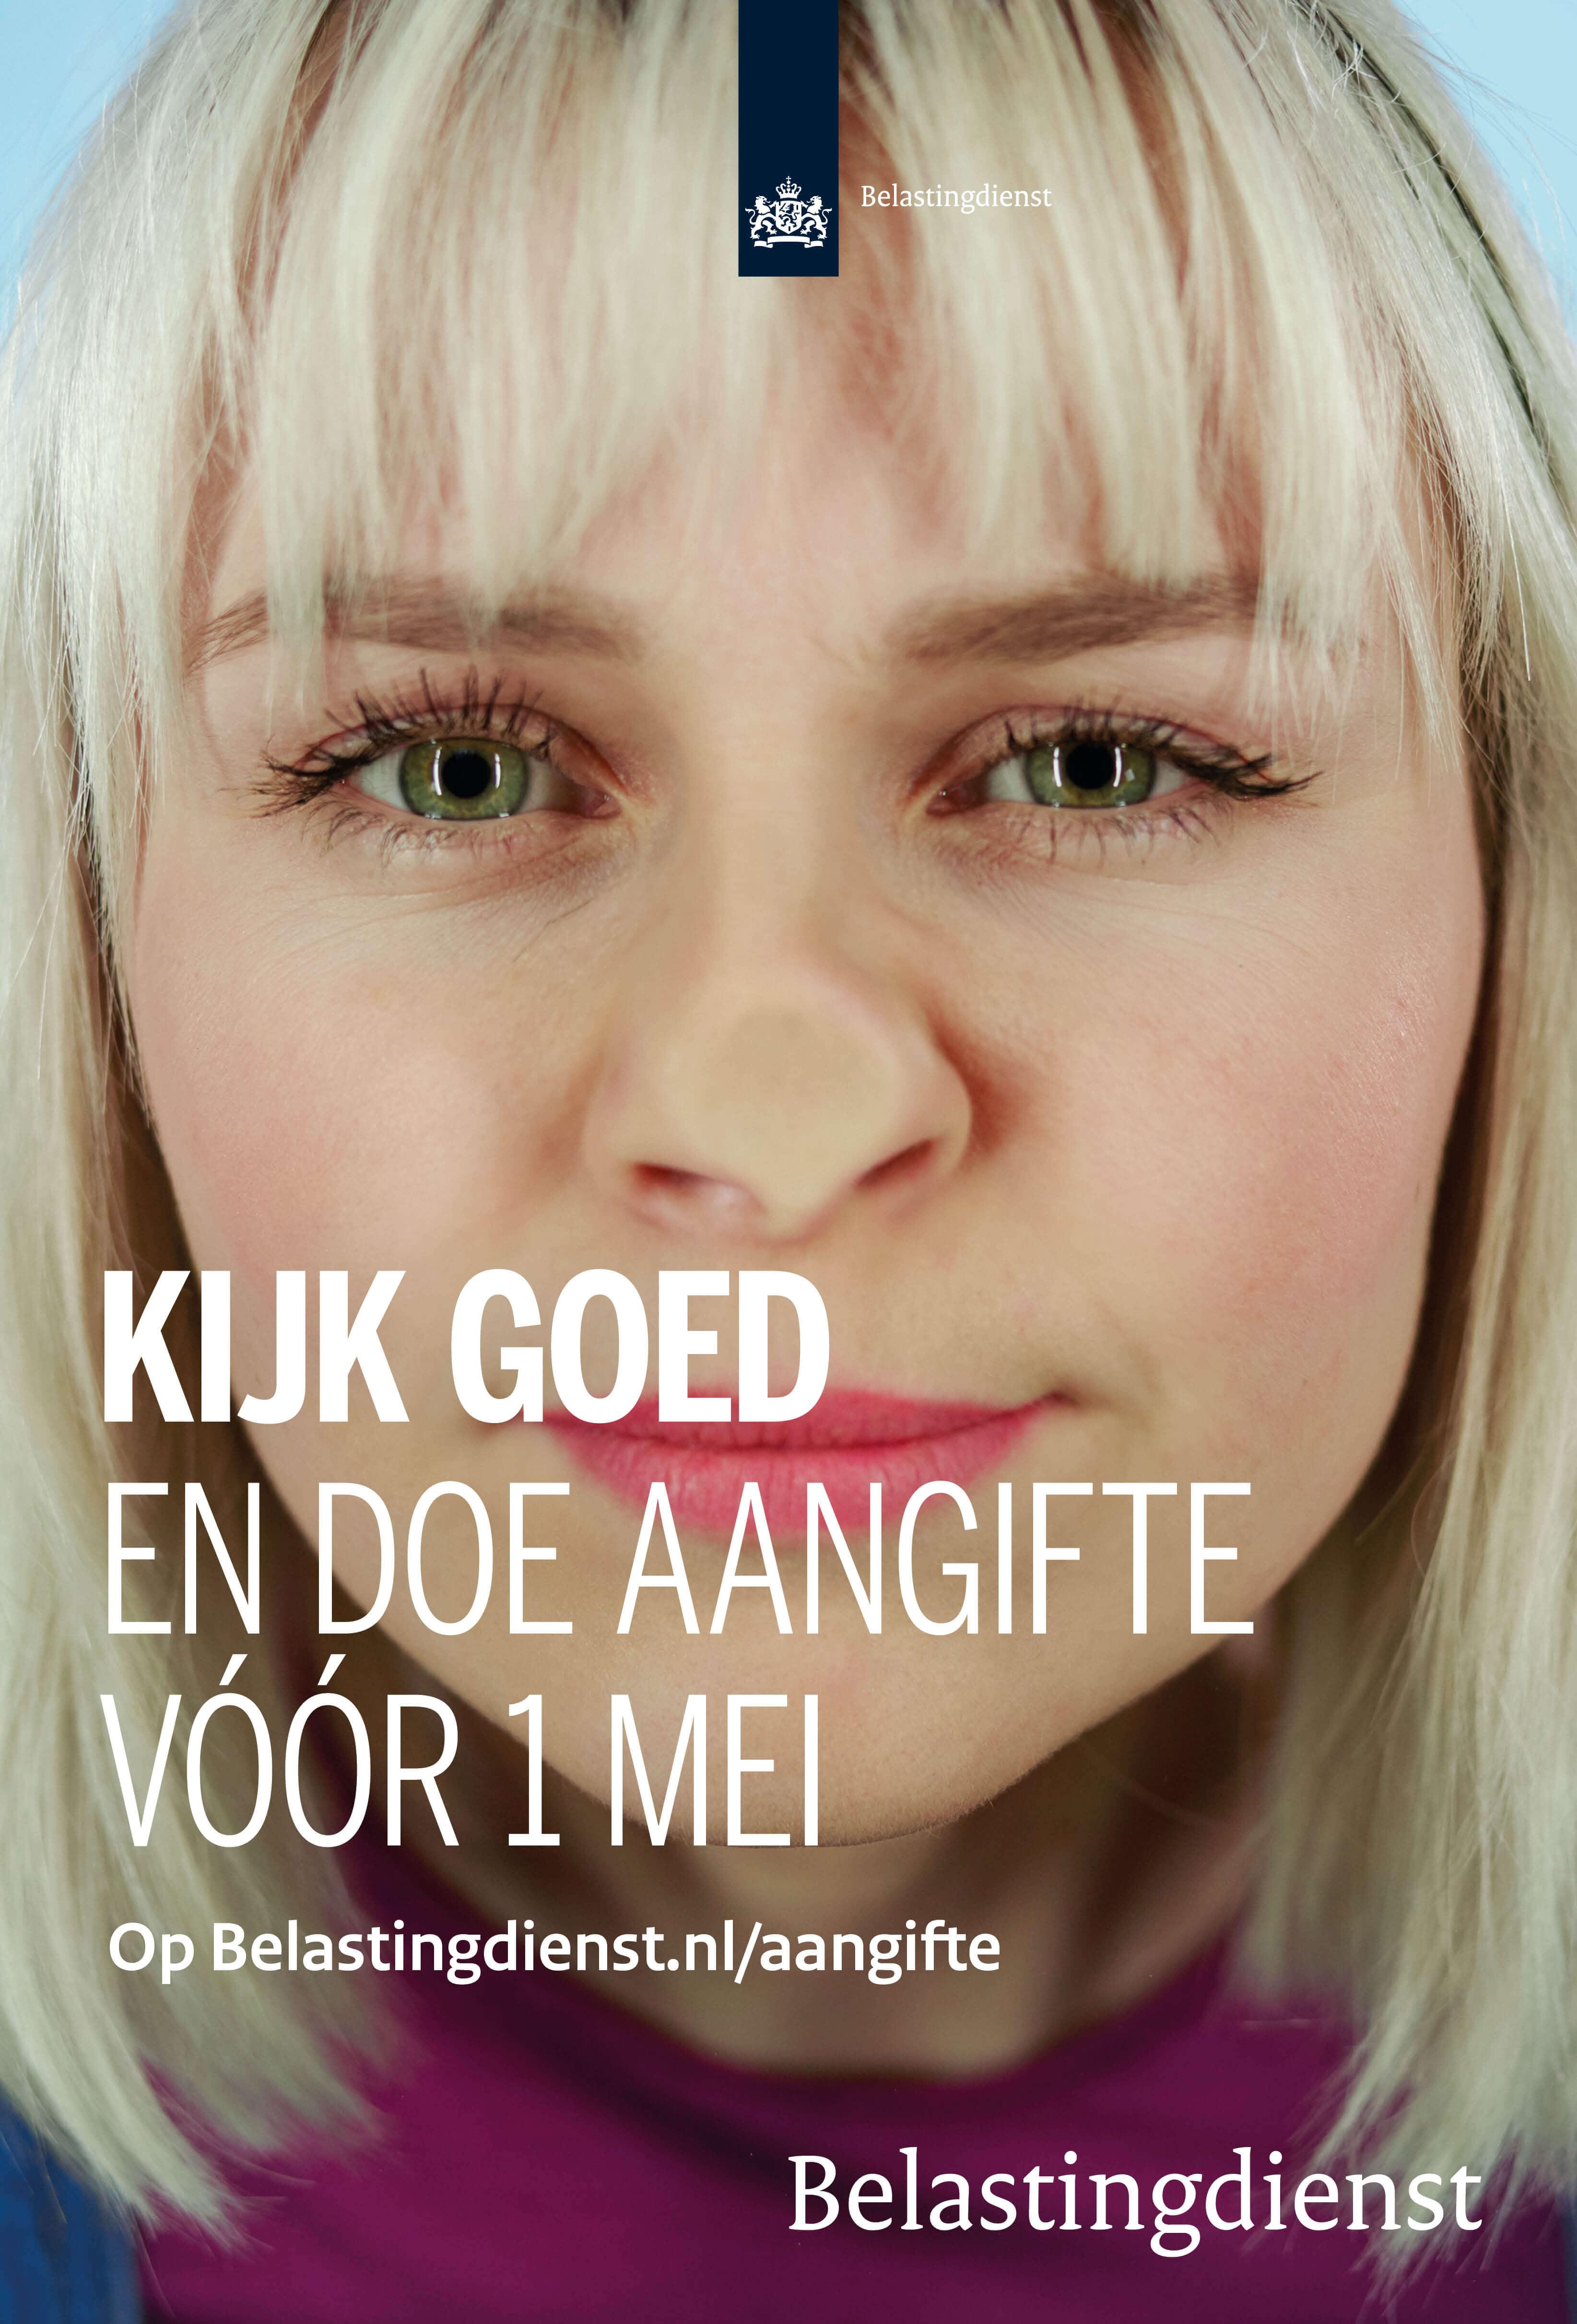 RO_Aangifte_abri_1160x1710B-klein2 Rene Nuijens fotografie photography art belastingdienst portrait portret reclame fotograaf Amsterdam